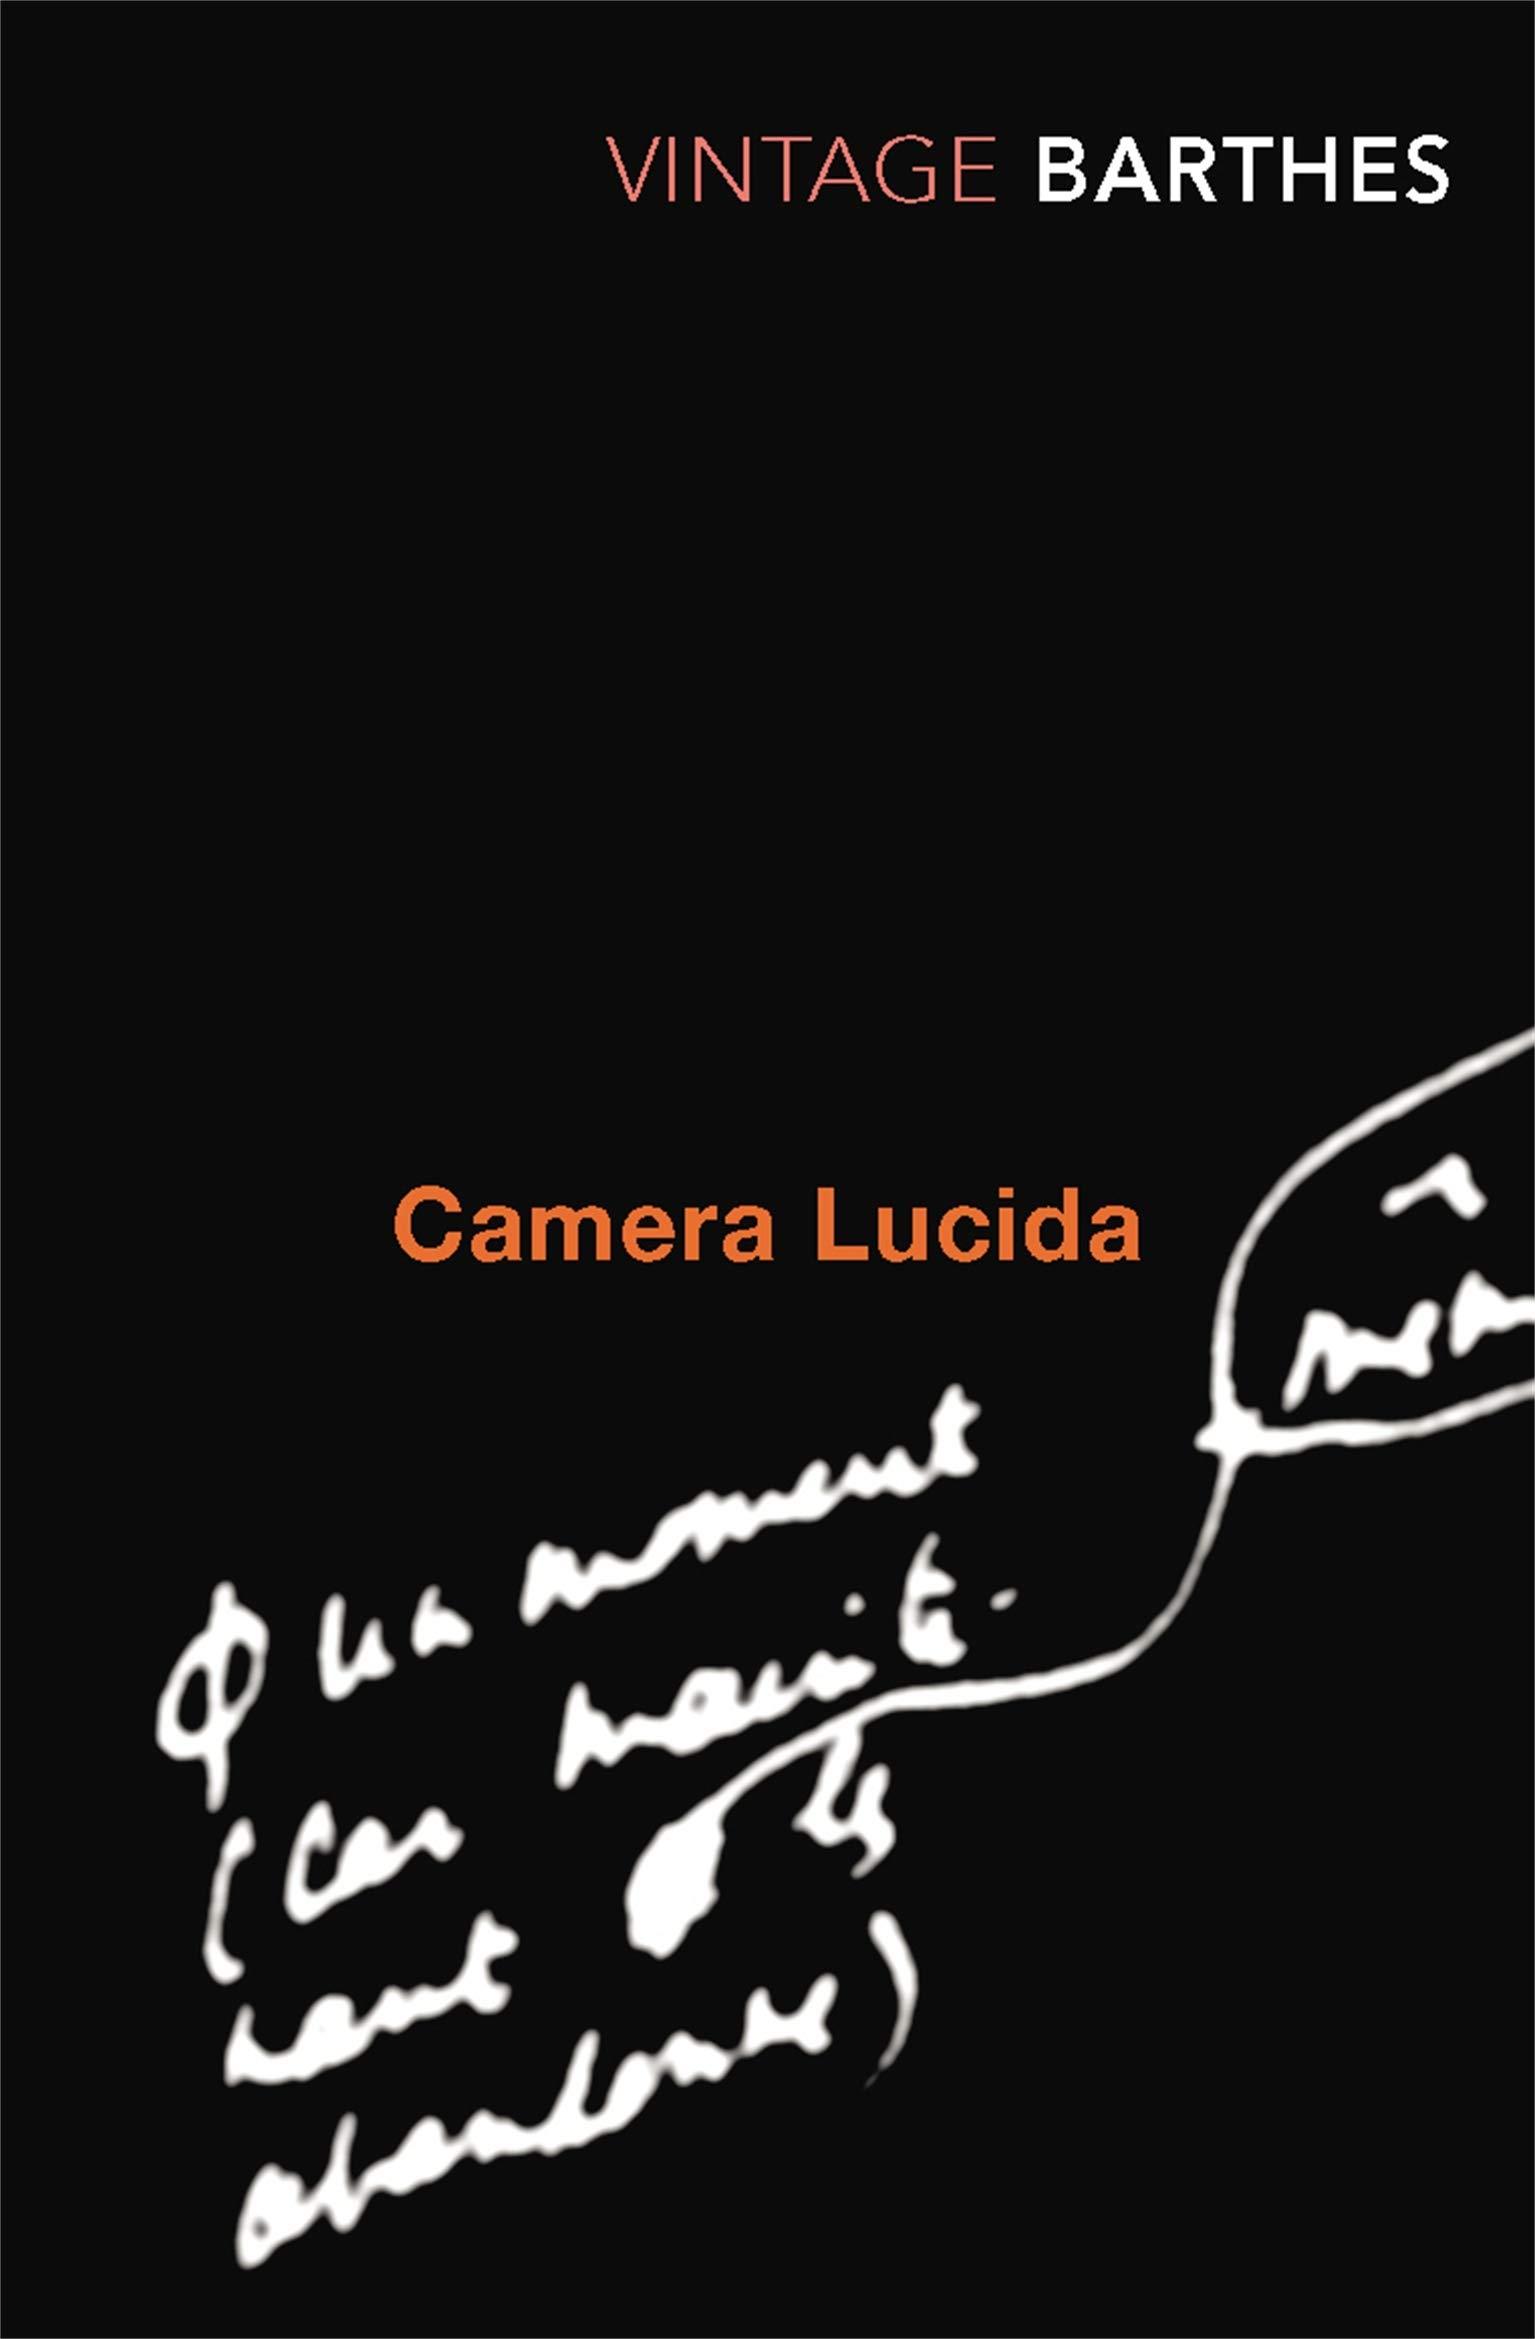 Barthes, Roland. Camera Lucida